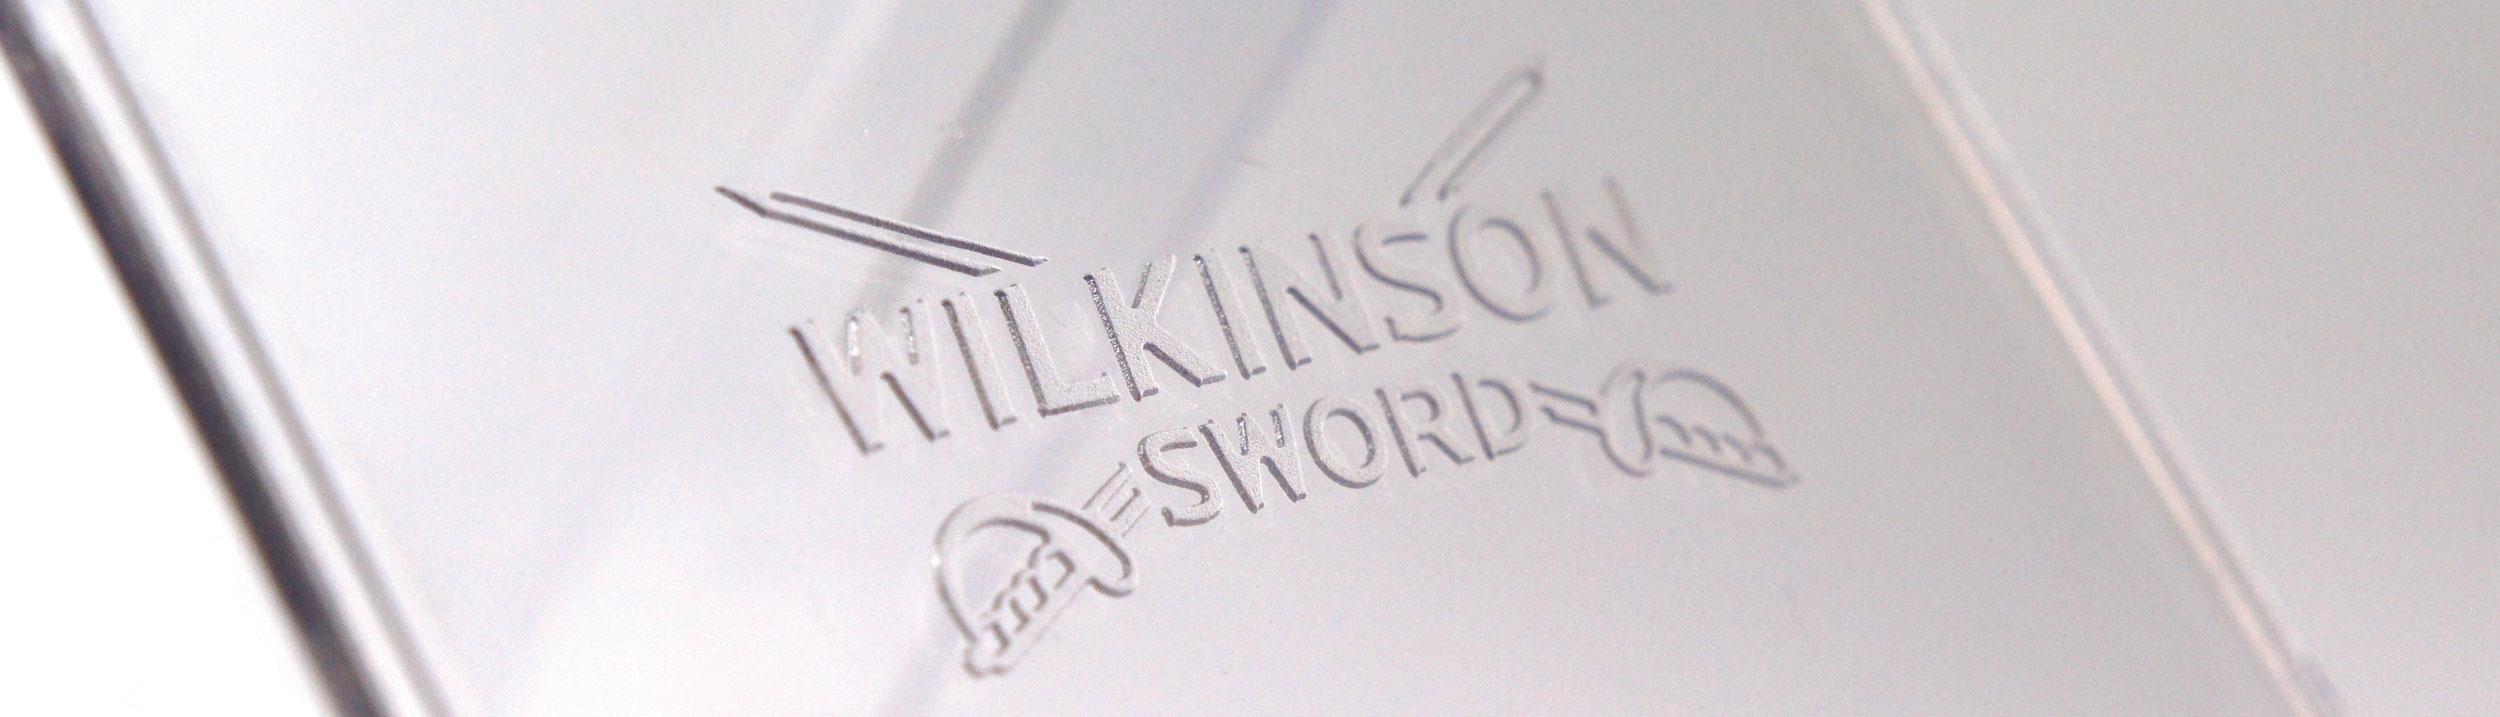 Boîtier | Gravure | Wilkinson large